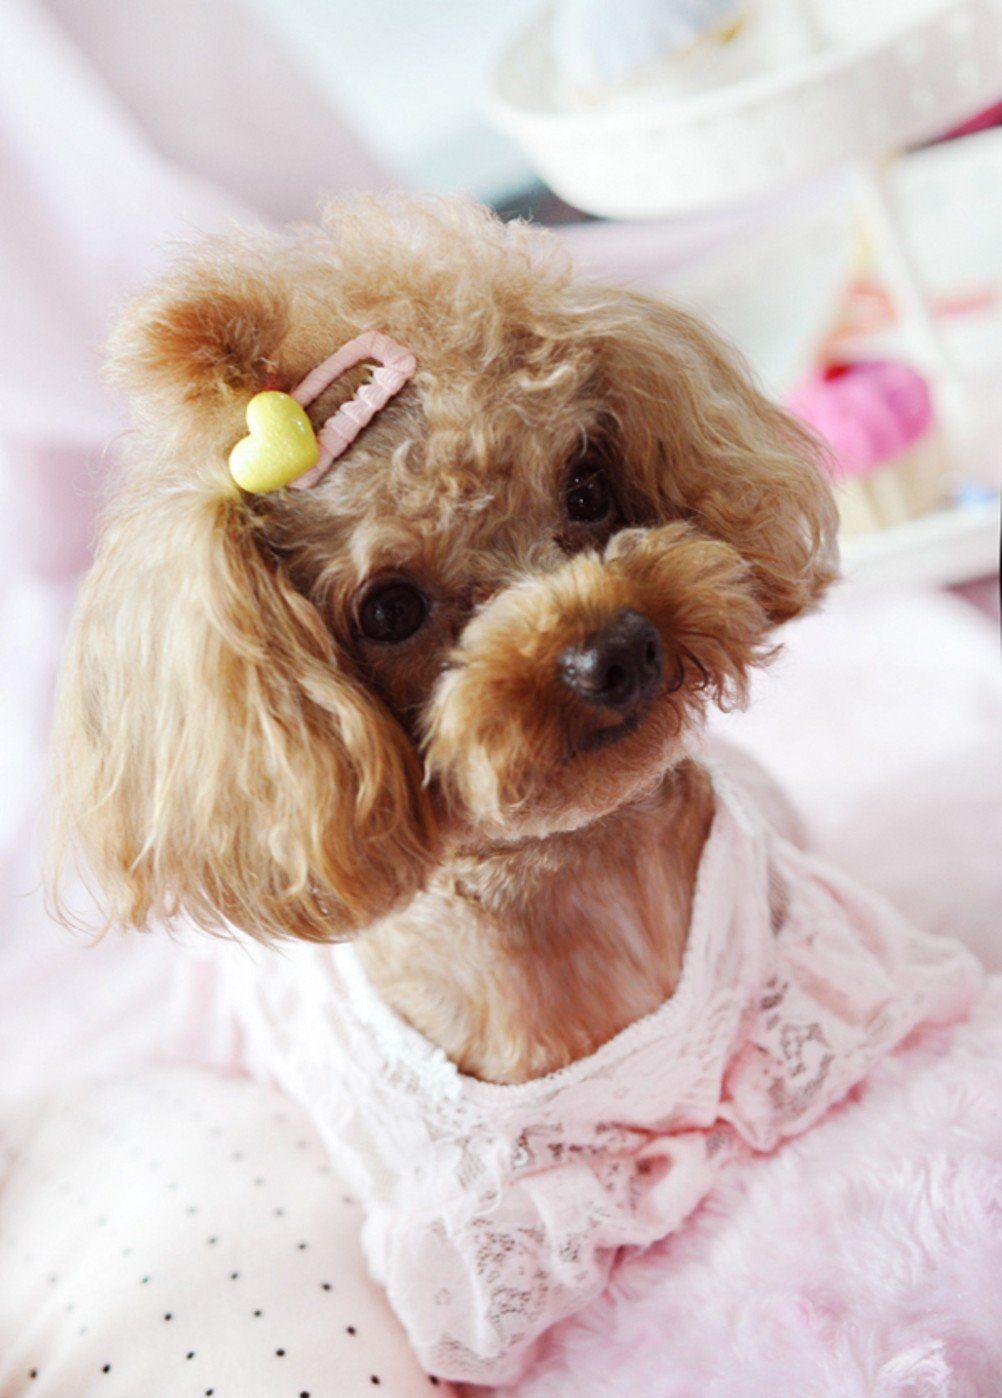 Amazing Hair Bows Bow Adorable Dog - 56d57669603b1b6fc4b5ba46e523e9a1  Snapshot_229743  .jpg